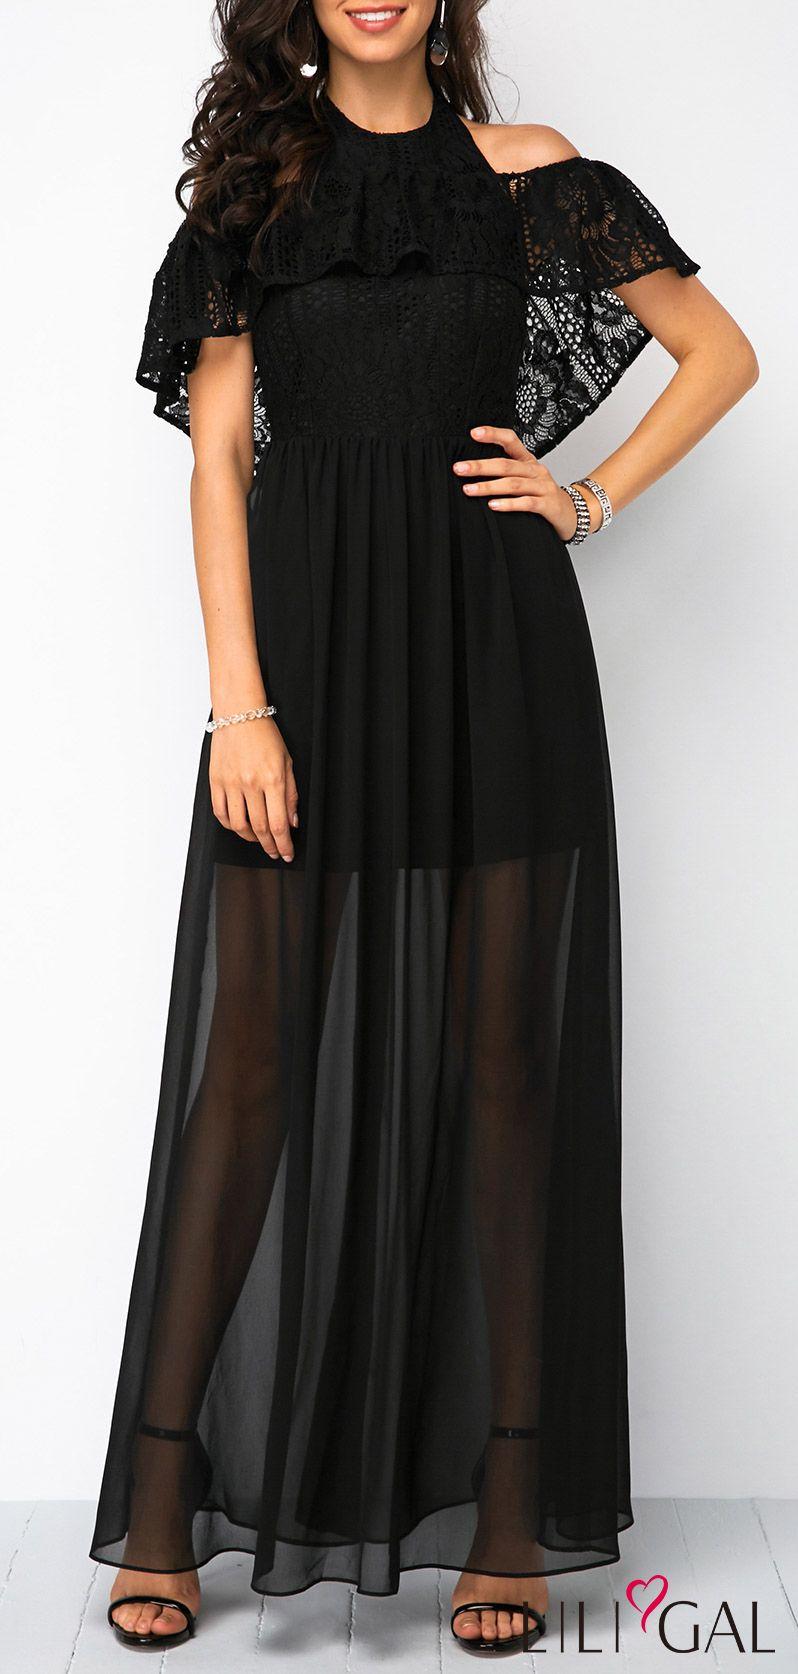 f1ba5e27d2 Lace Patchwork Halter Neck Black Maxi Dress #liligal #dresses #womenswear # womensfashion